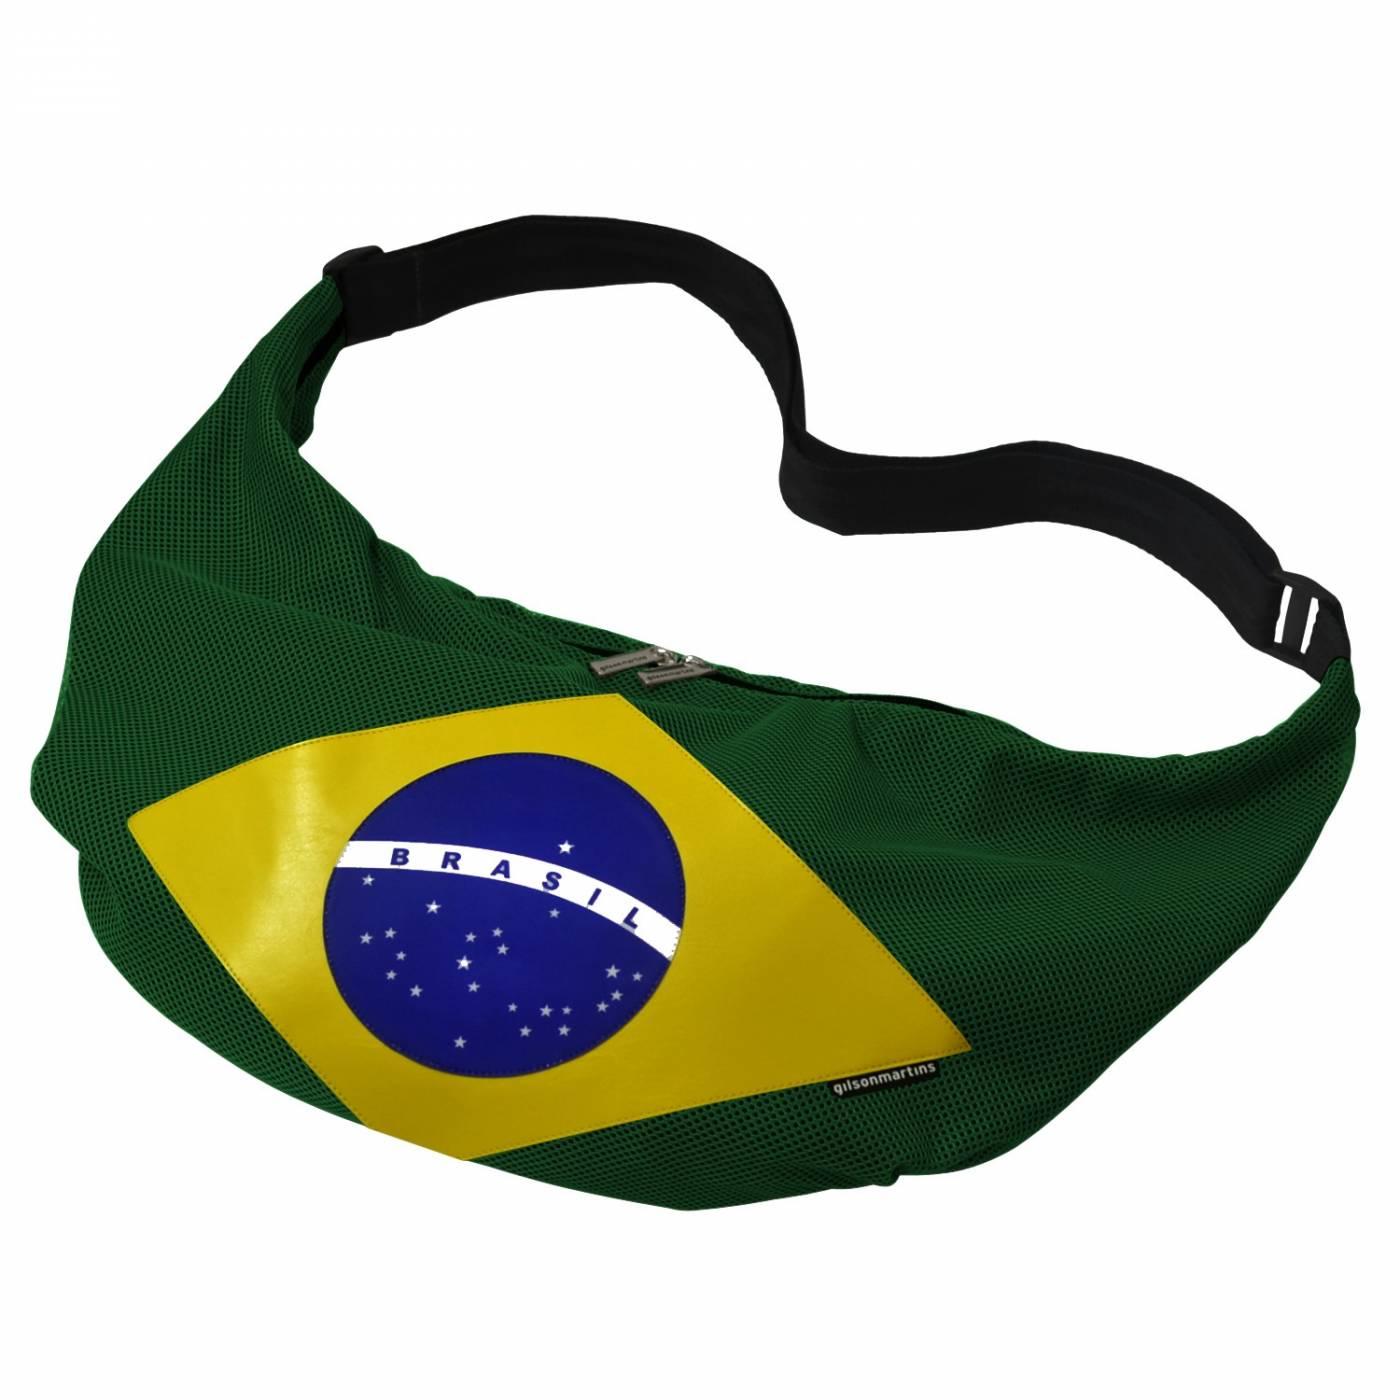 Bolsa Transversal Brasil Fitness Praia Rafting